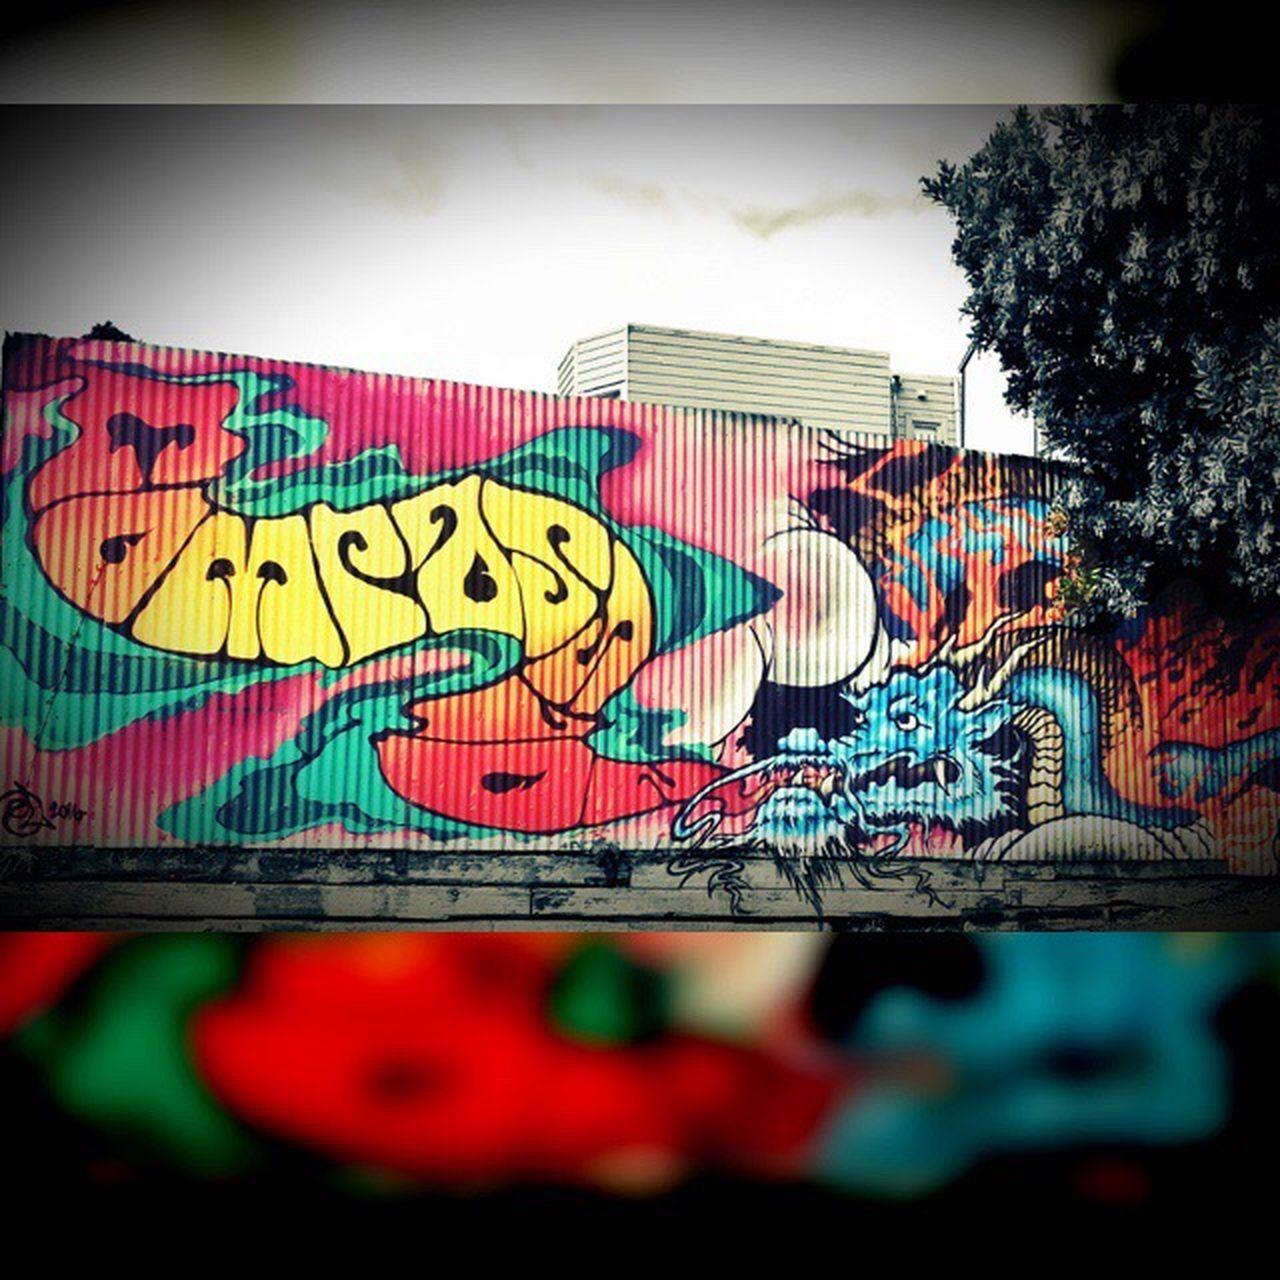 San Francisco Urbangraffiti UrbanART Bay Area California Yee